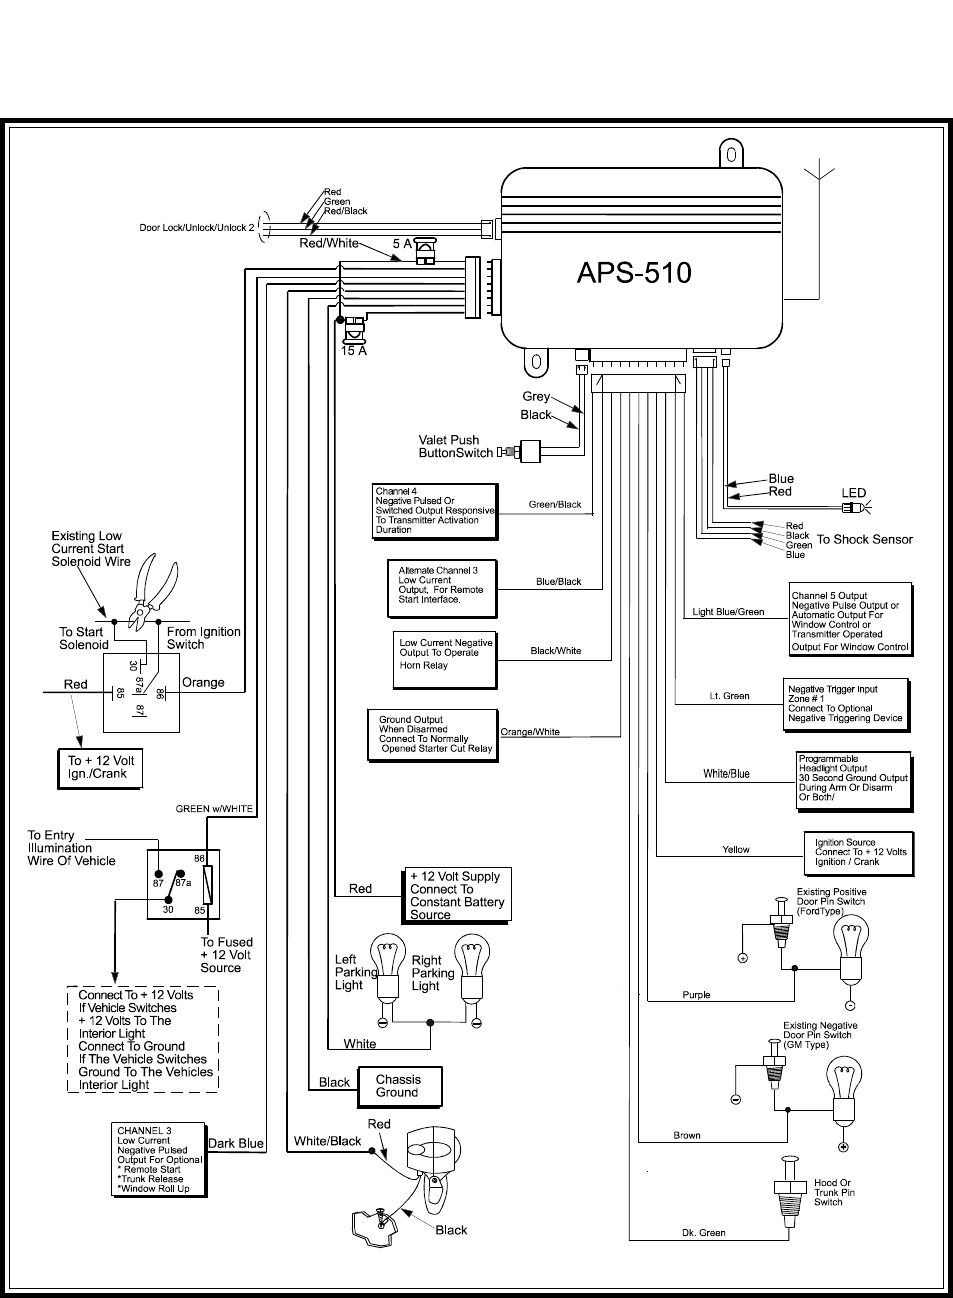 bulldog car alarm wiring diagram Download-Car Security Alarm Wiring Diagram ShrutiRadio For mando 11 13-d